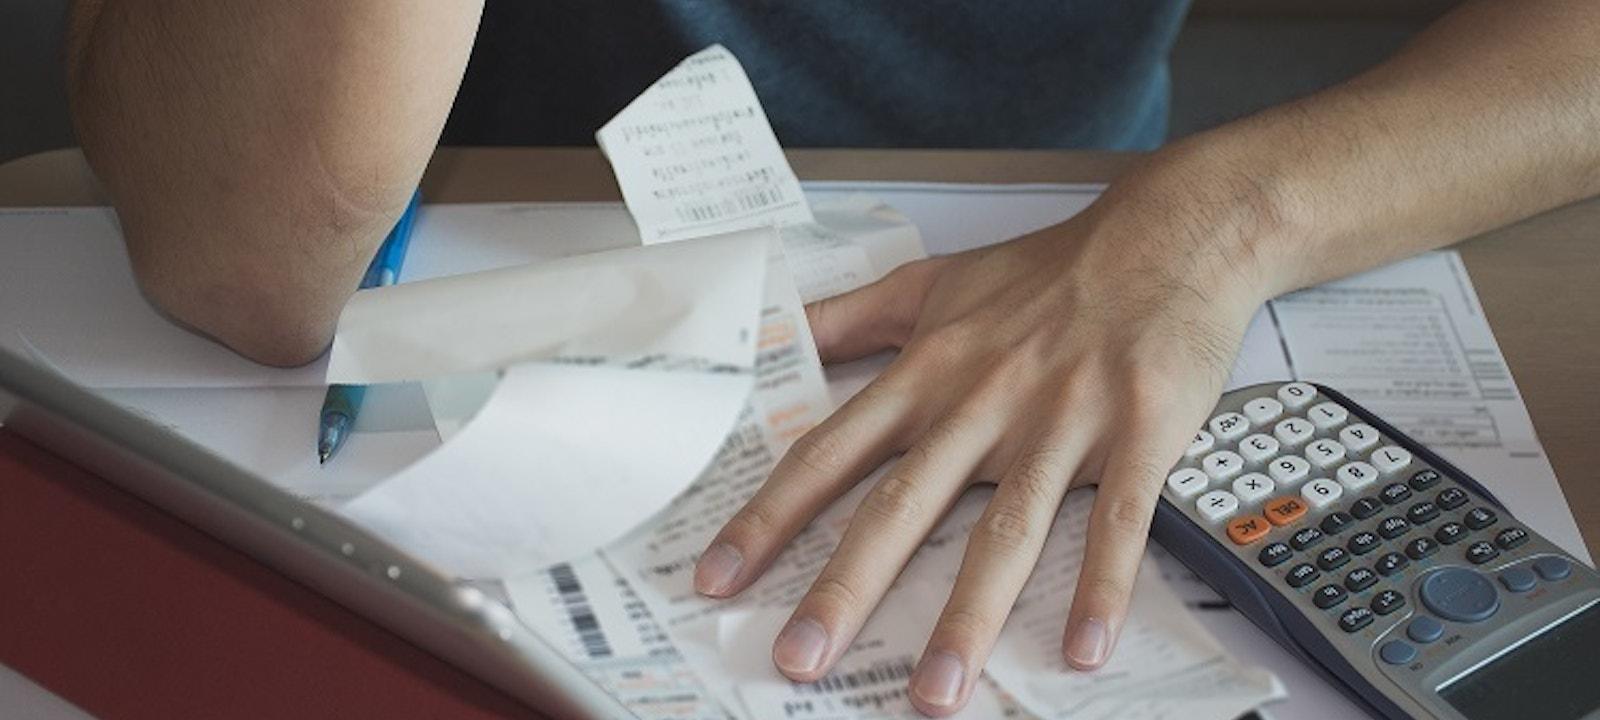 Debt stress from a financial emergency